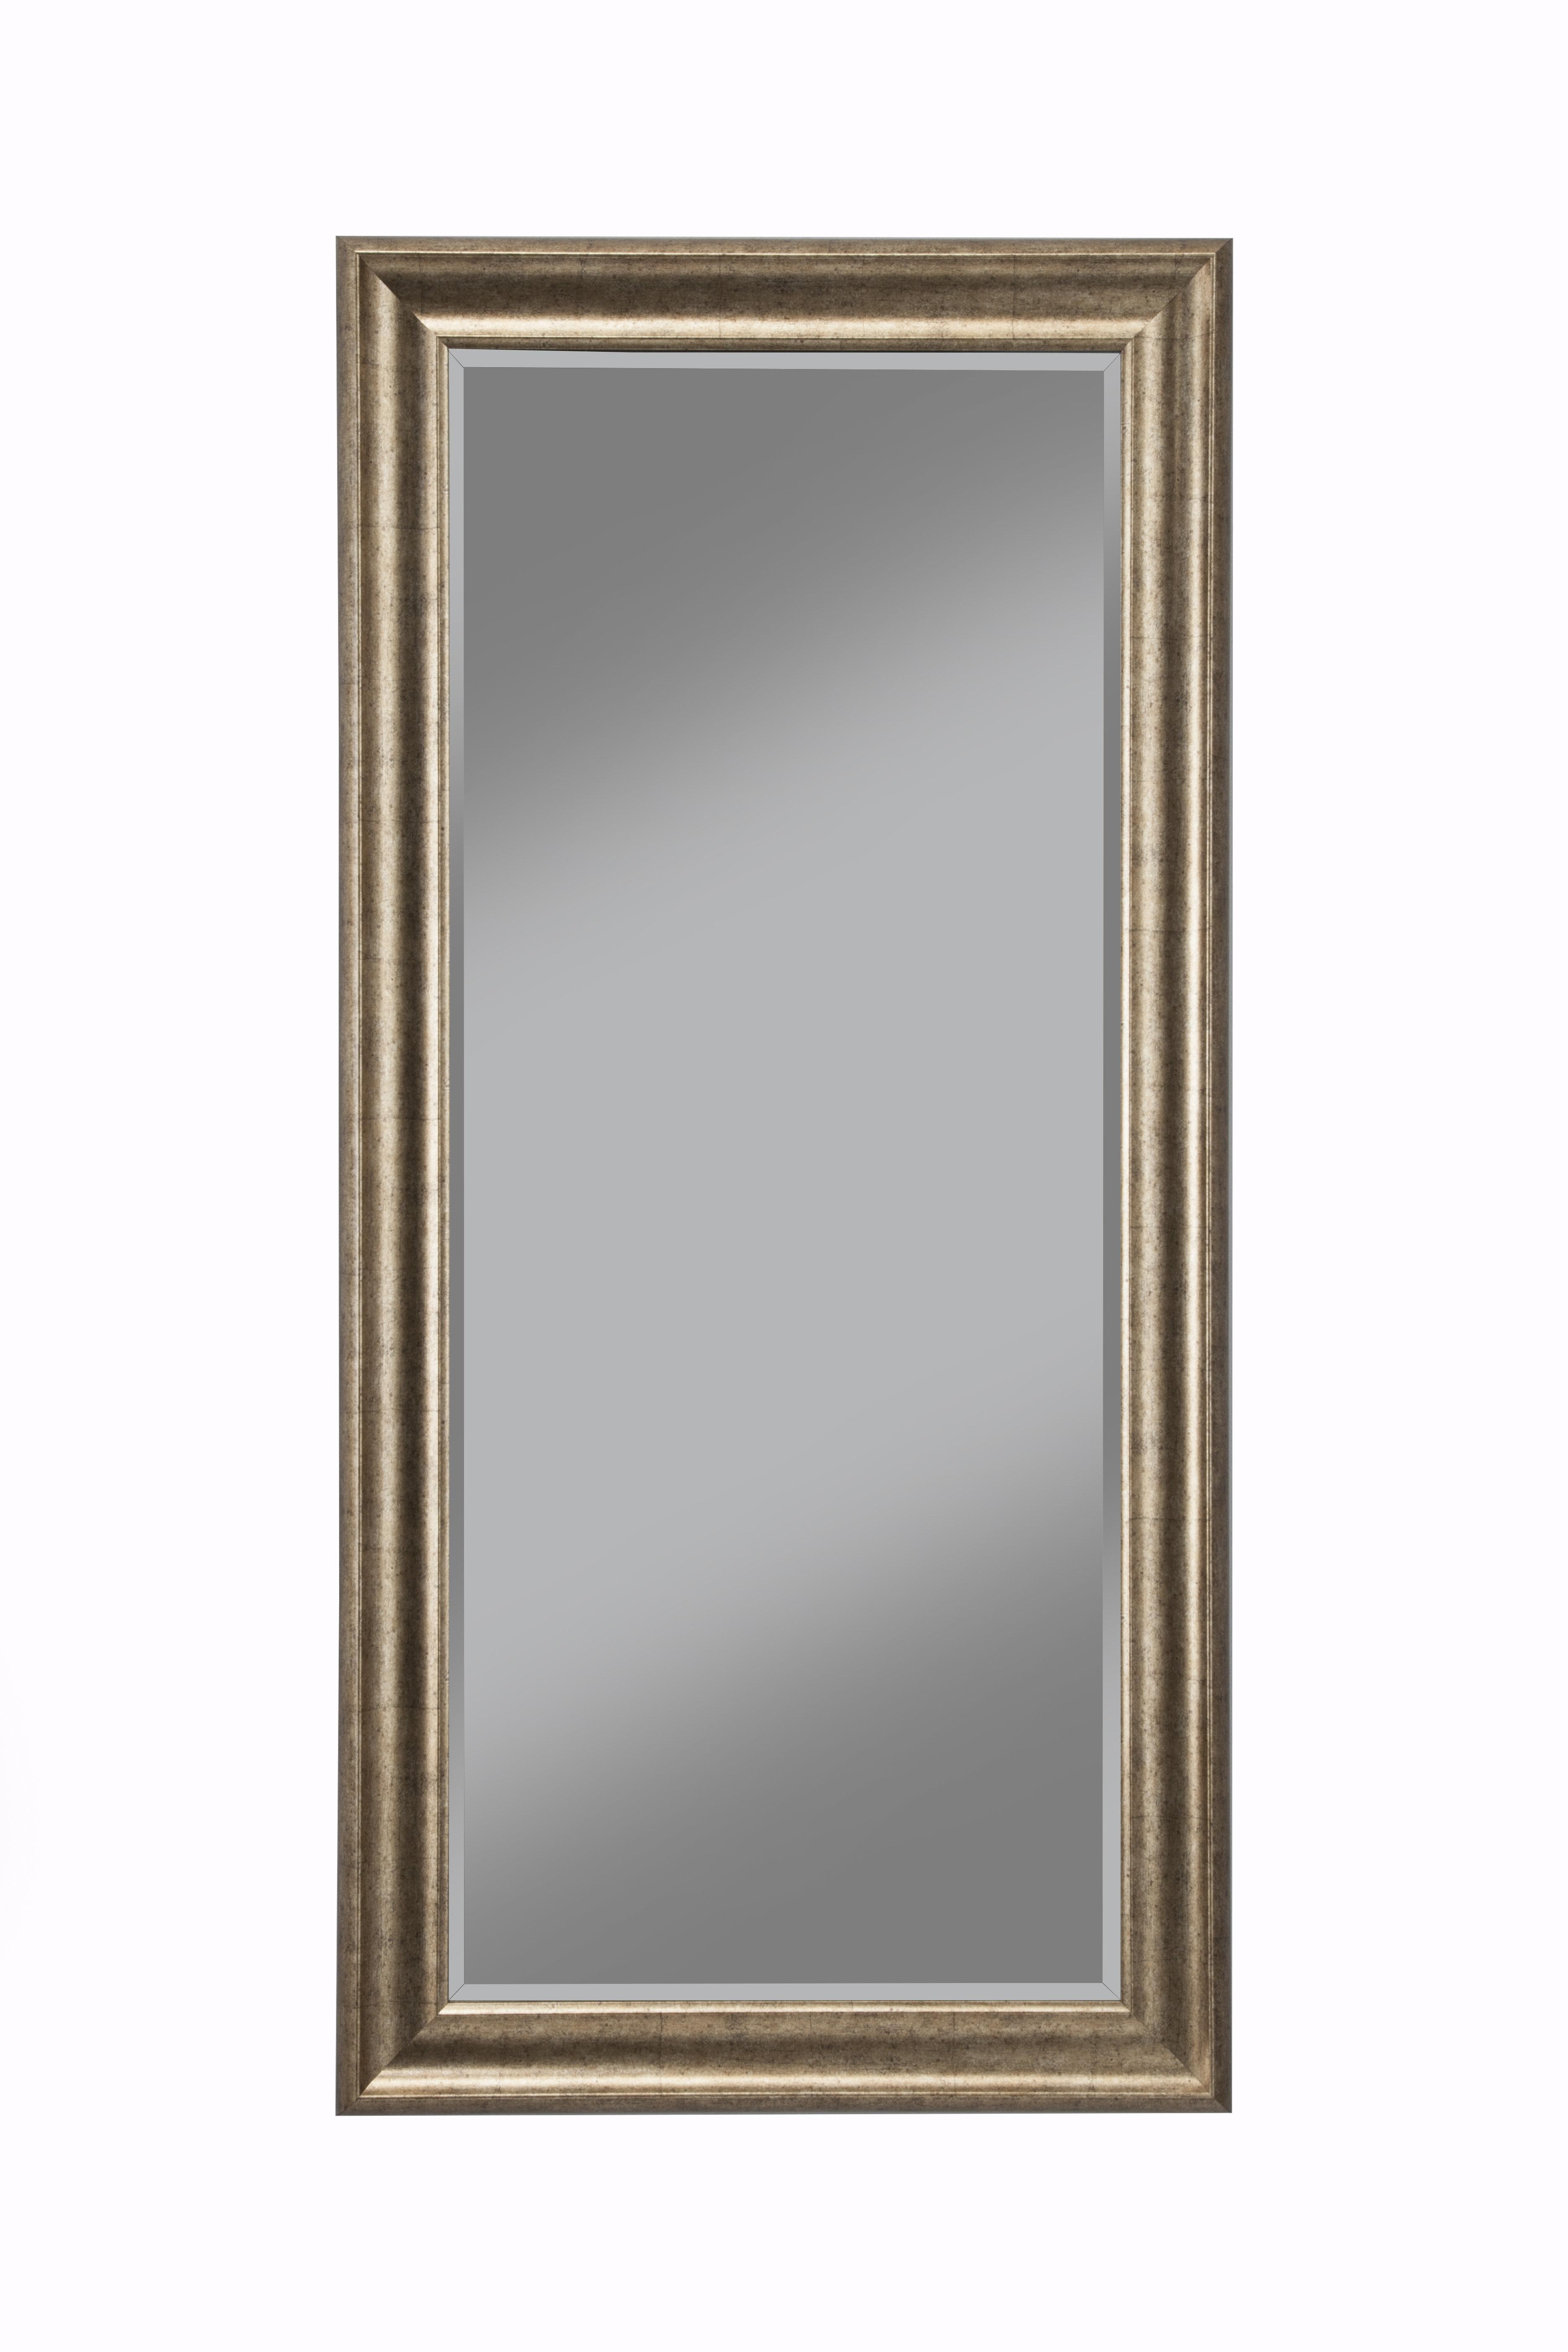 Modern Black Wall Mirrors   Allmodern Regarding Peetz Modern Rustic Accent Mirrors (View 24 of 30)